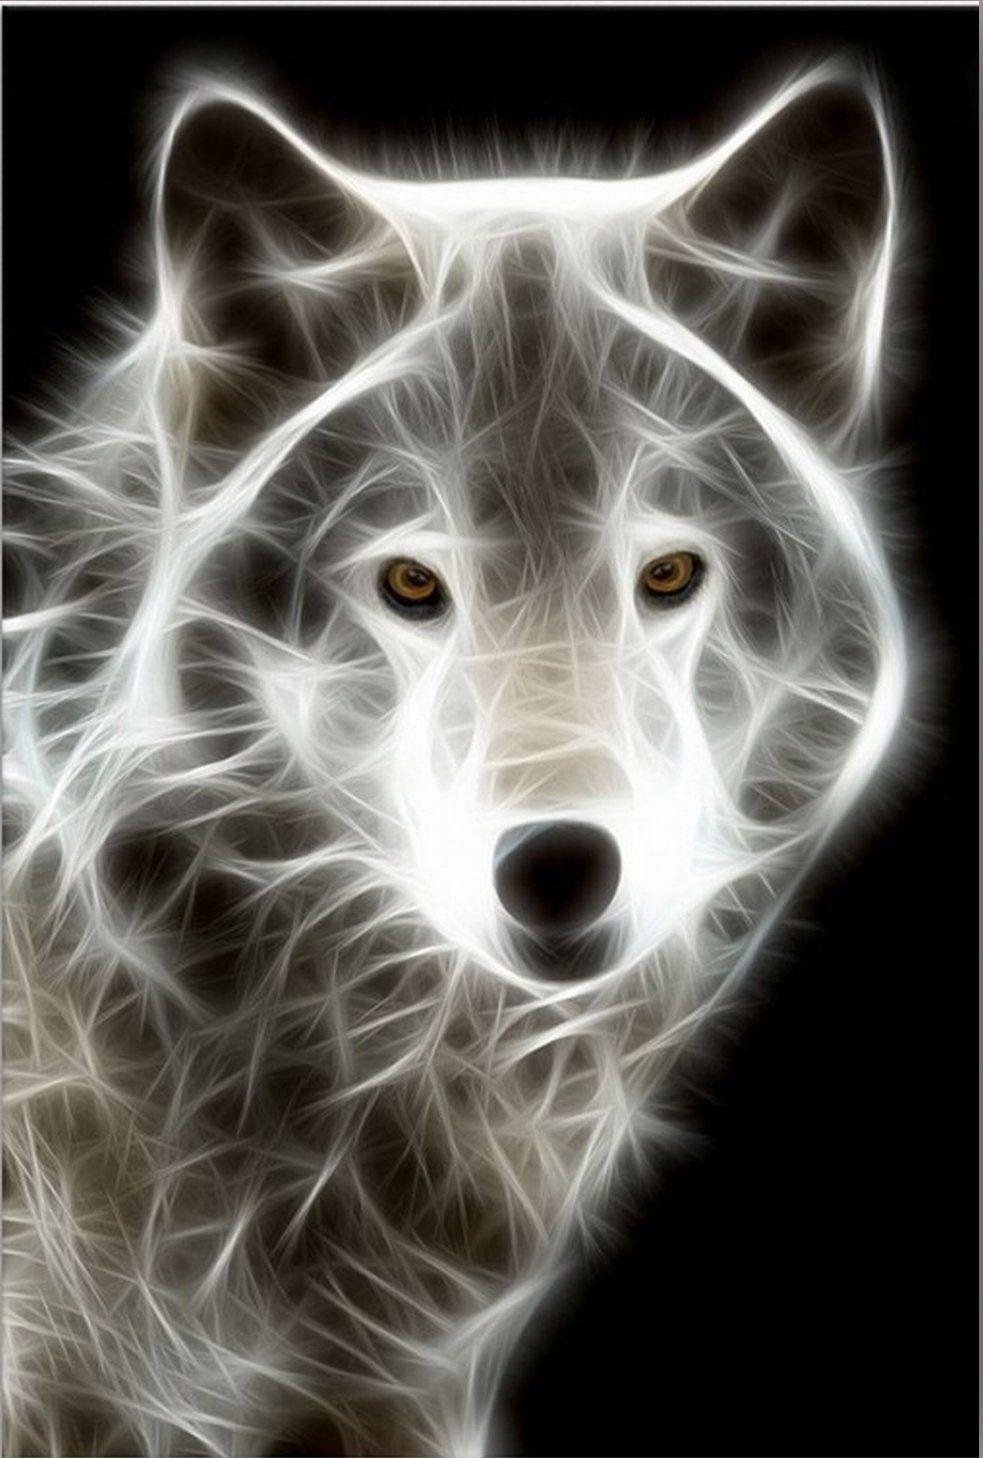 Amazon Com White Wolf Amazingly Canvas Wall Art Print 5 Stars Gift Startonight 23 62 X 35 43 In Music Themed Gif Original Art Painting White Wolf Animal Art